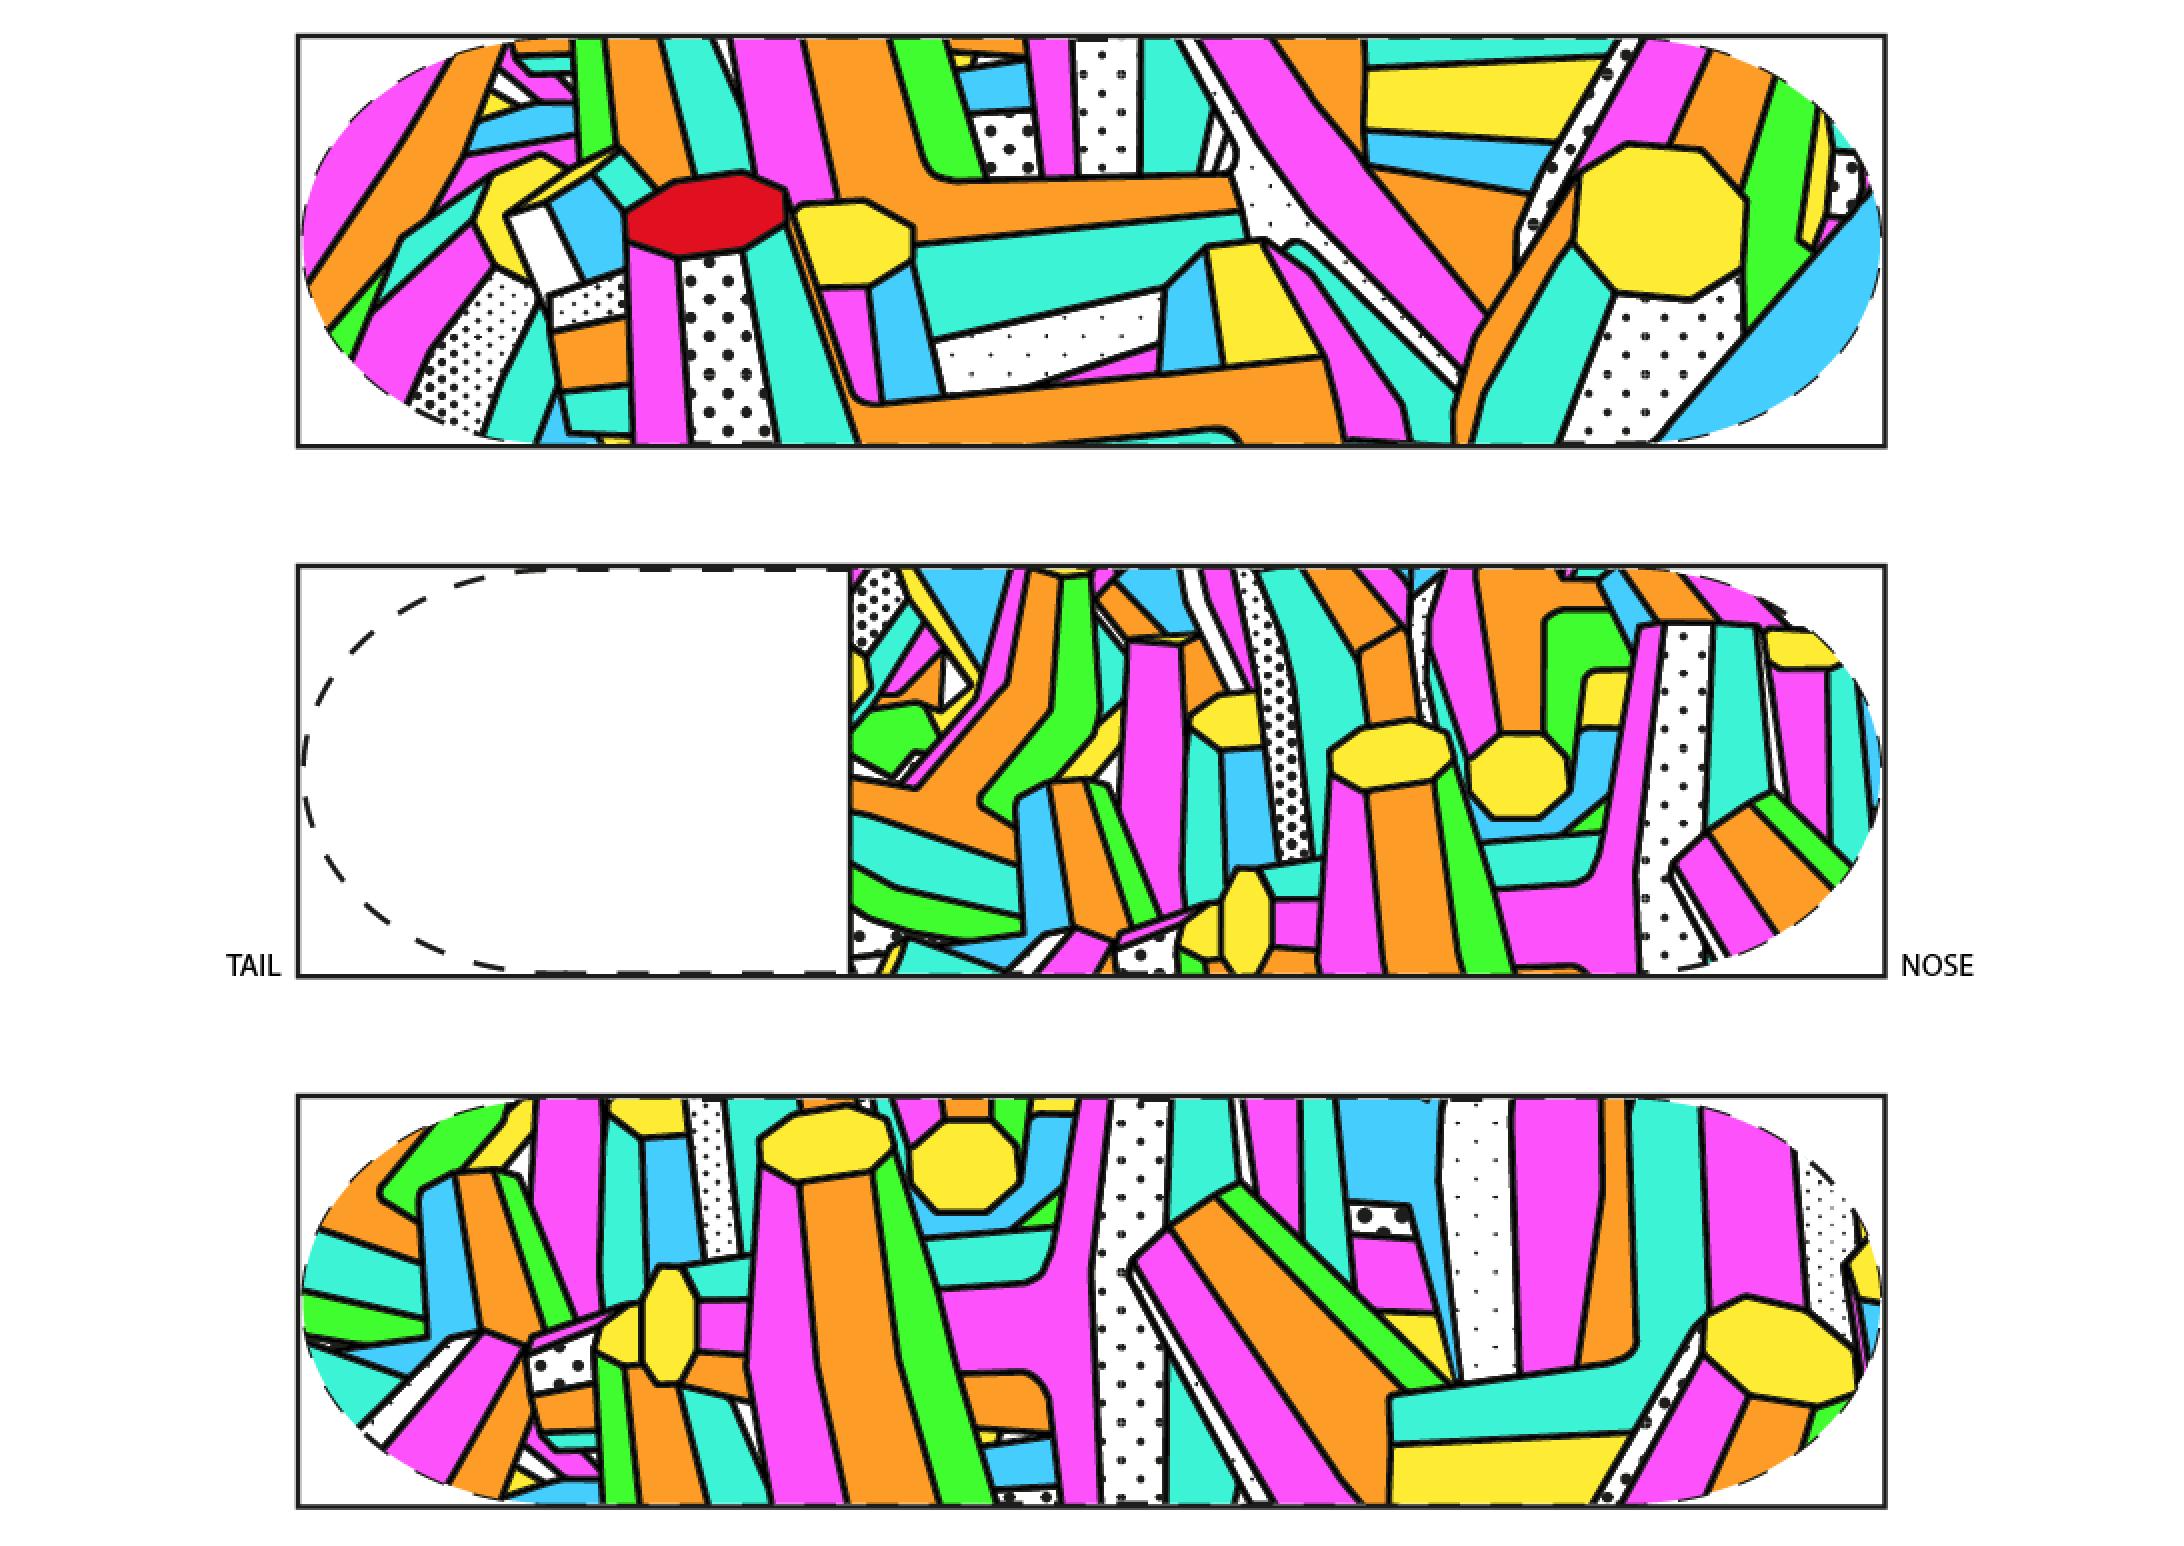 skateboard graphics on Illustrator #dothingsyoulove